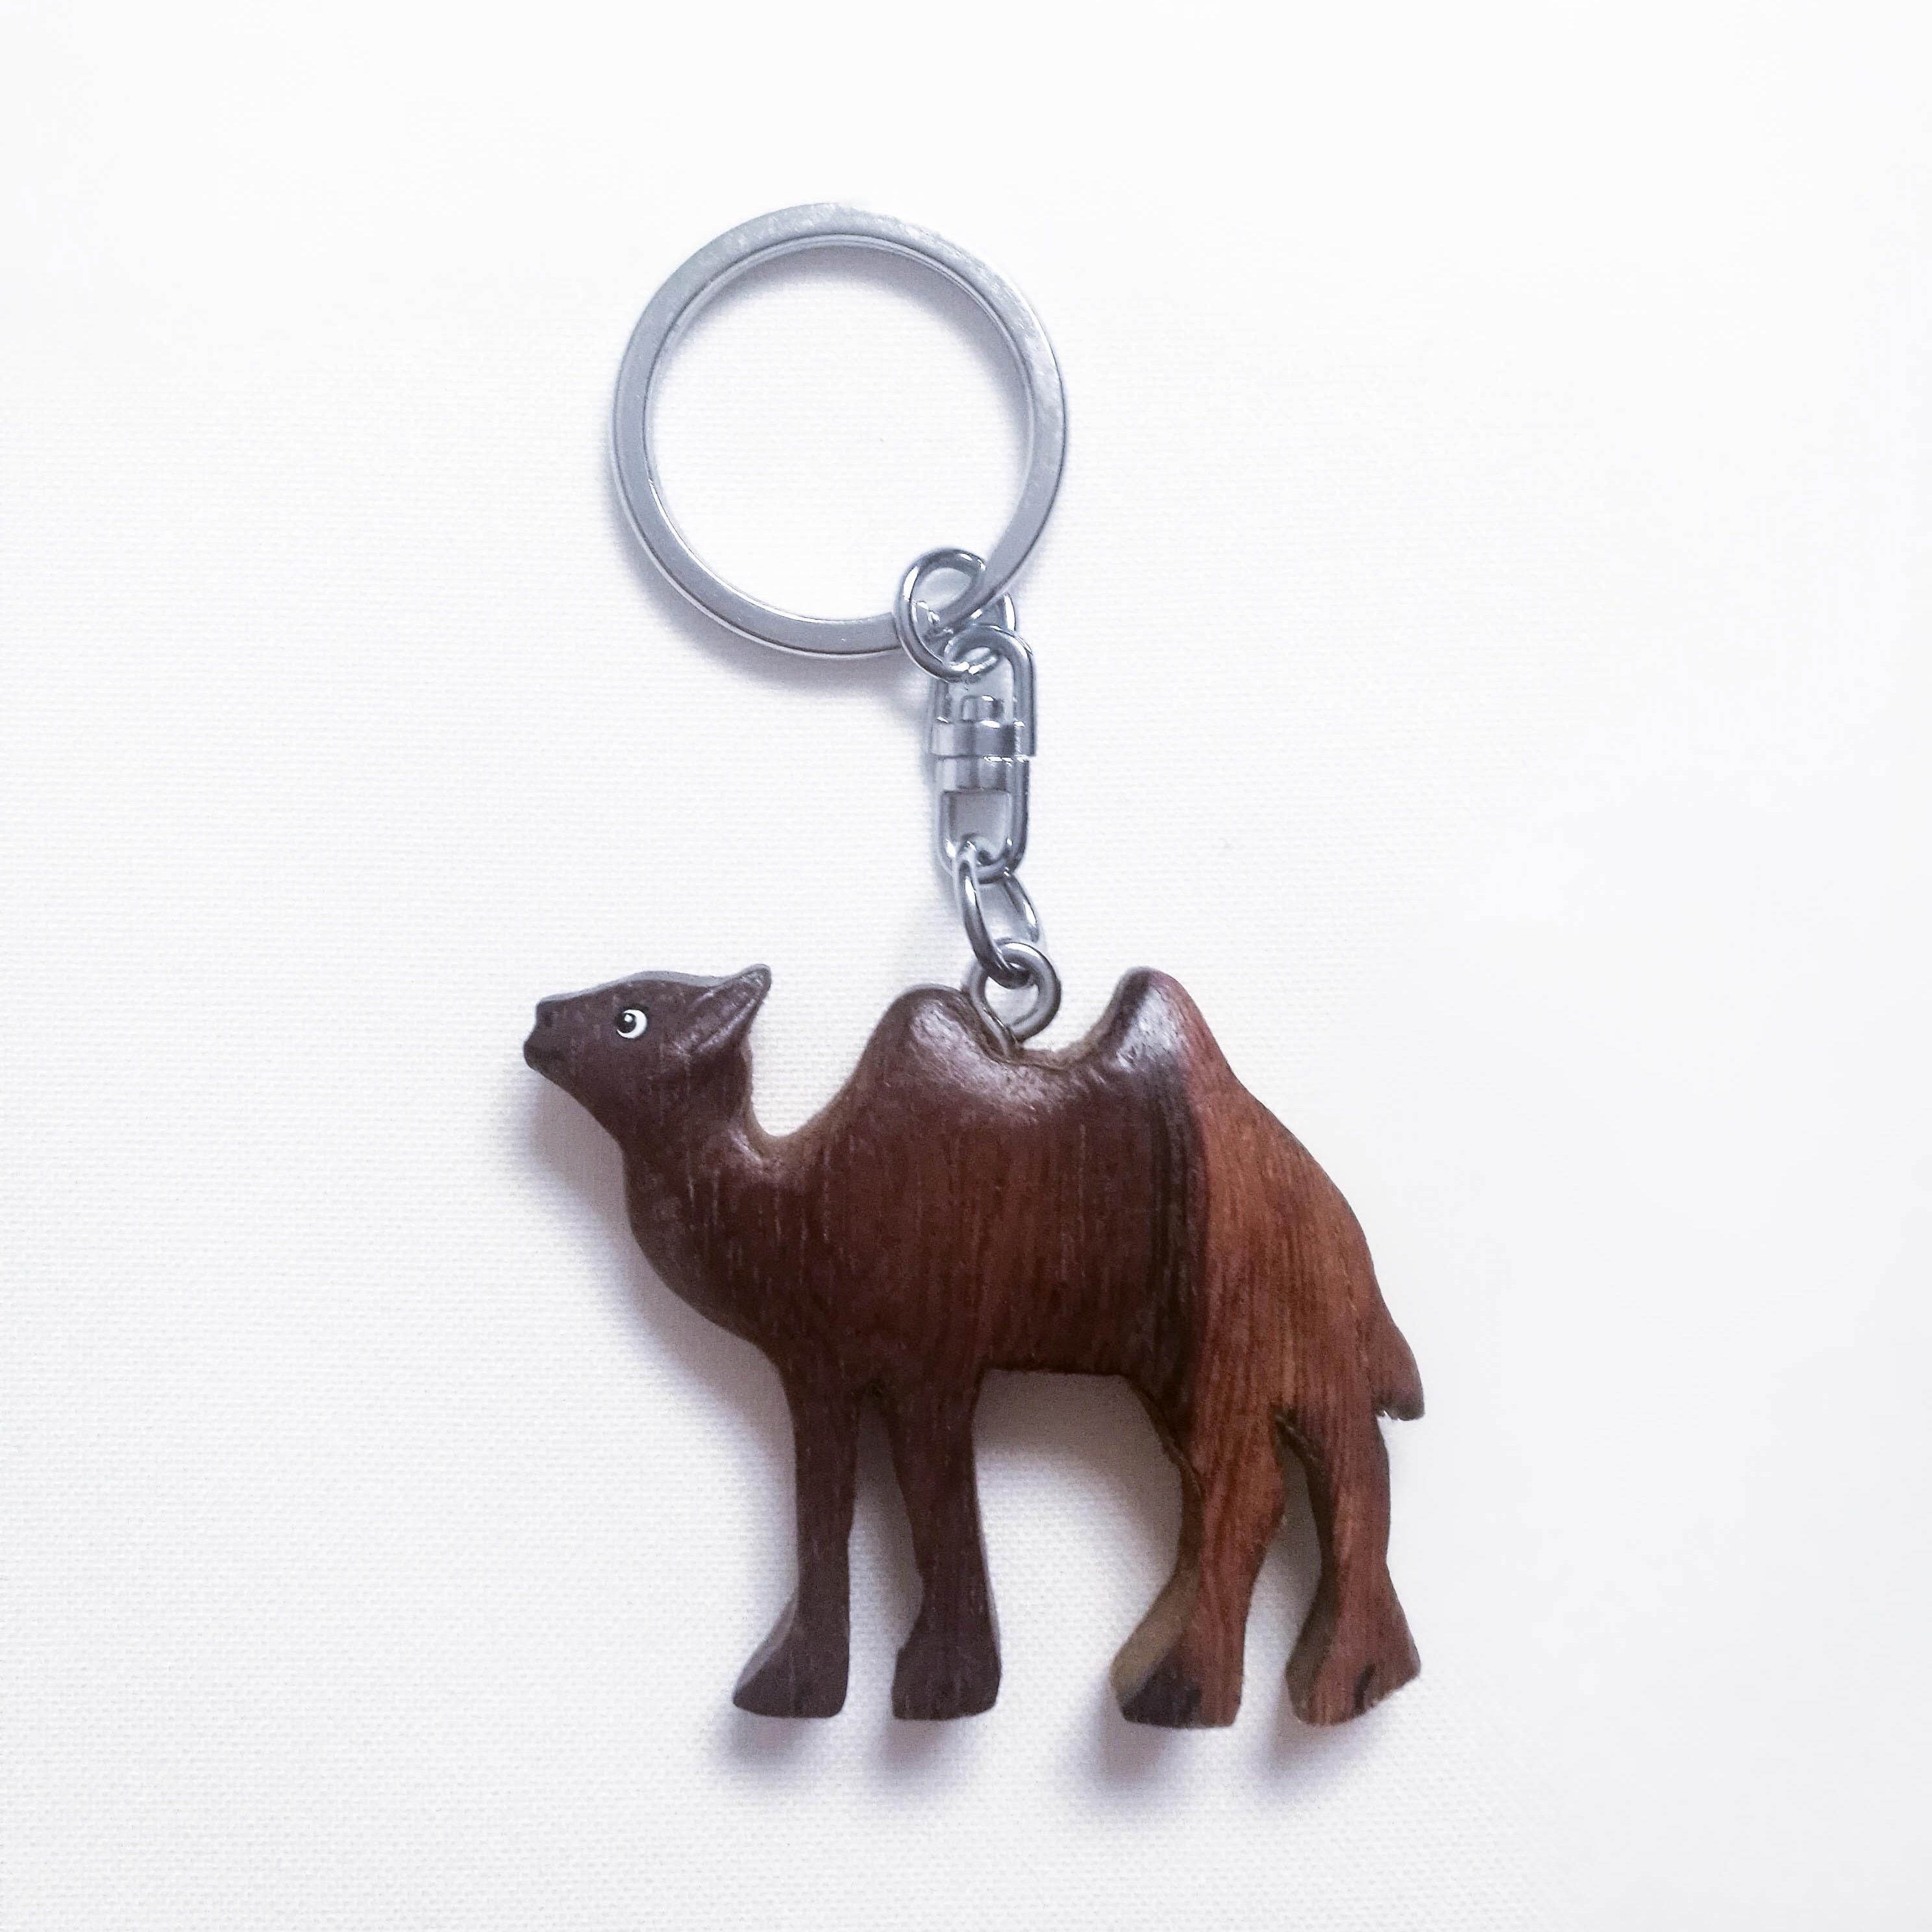 Schlüsselkette aus Holz Kamel